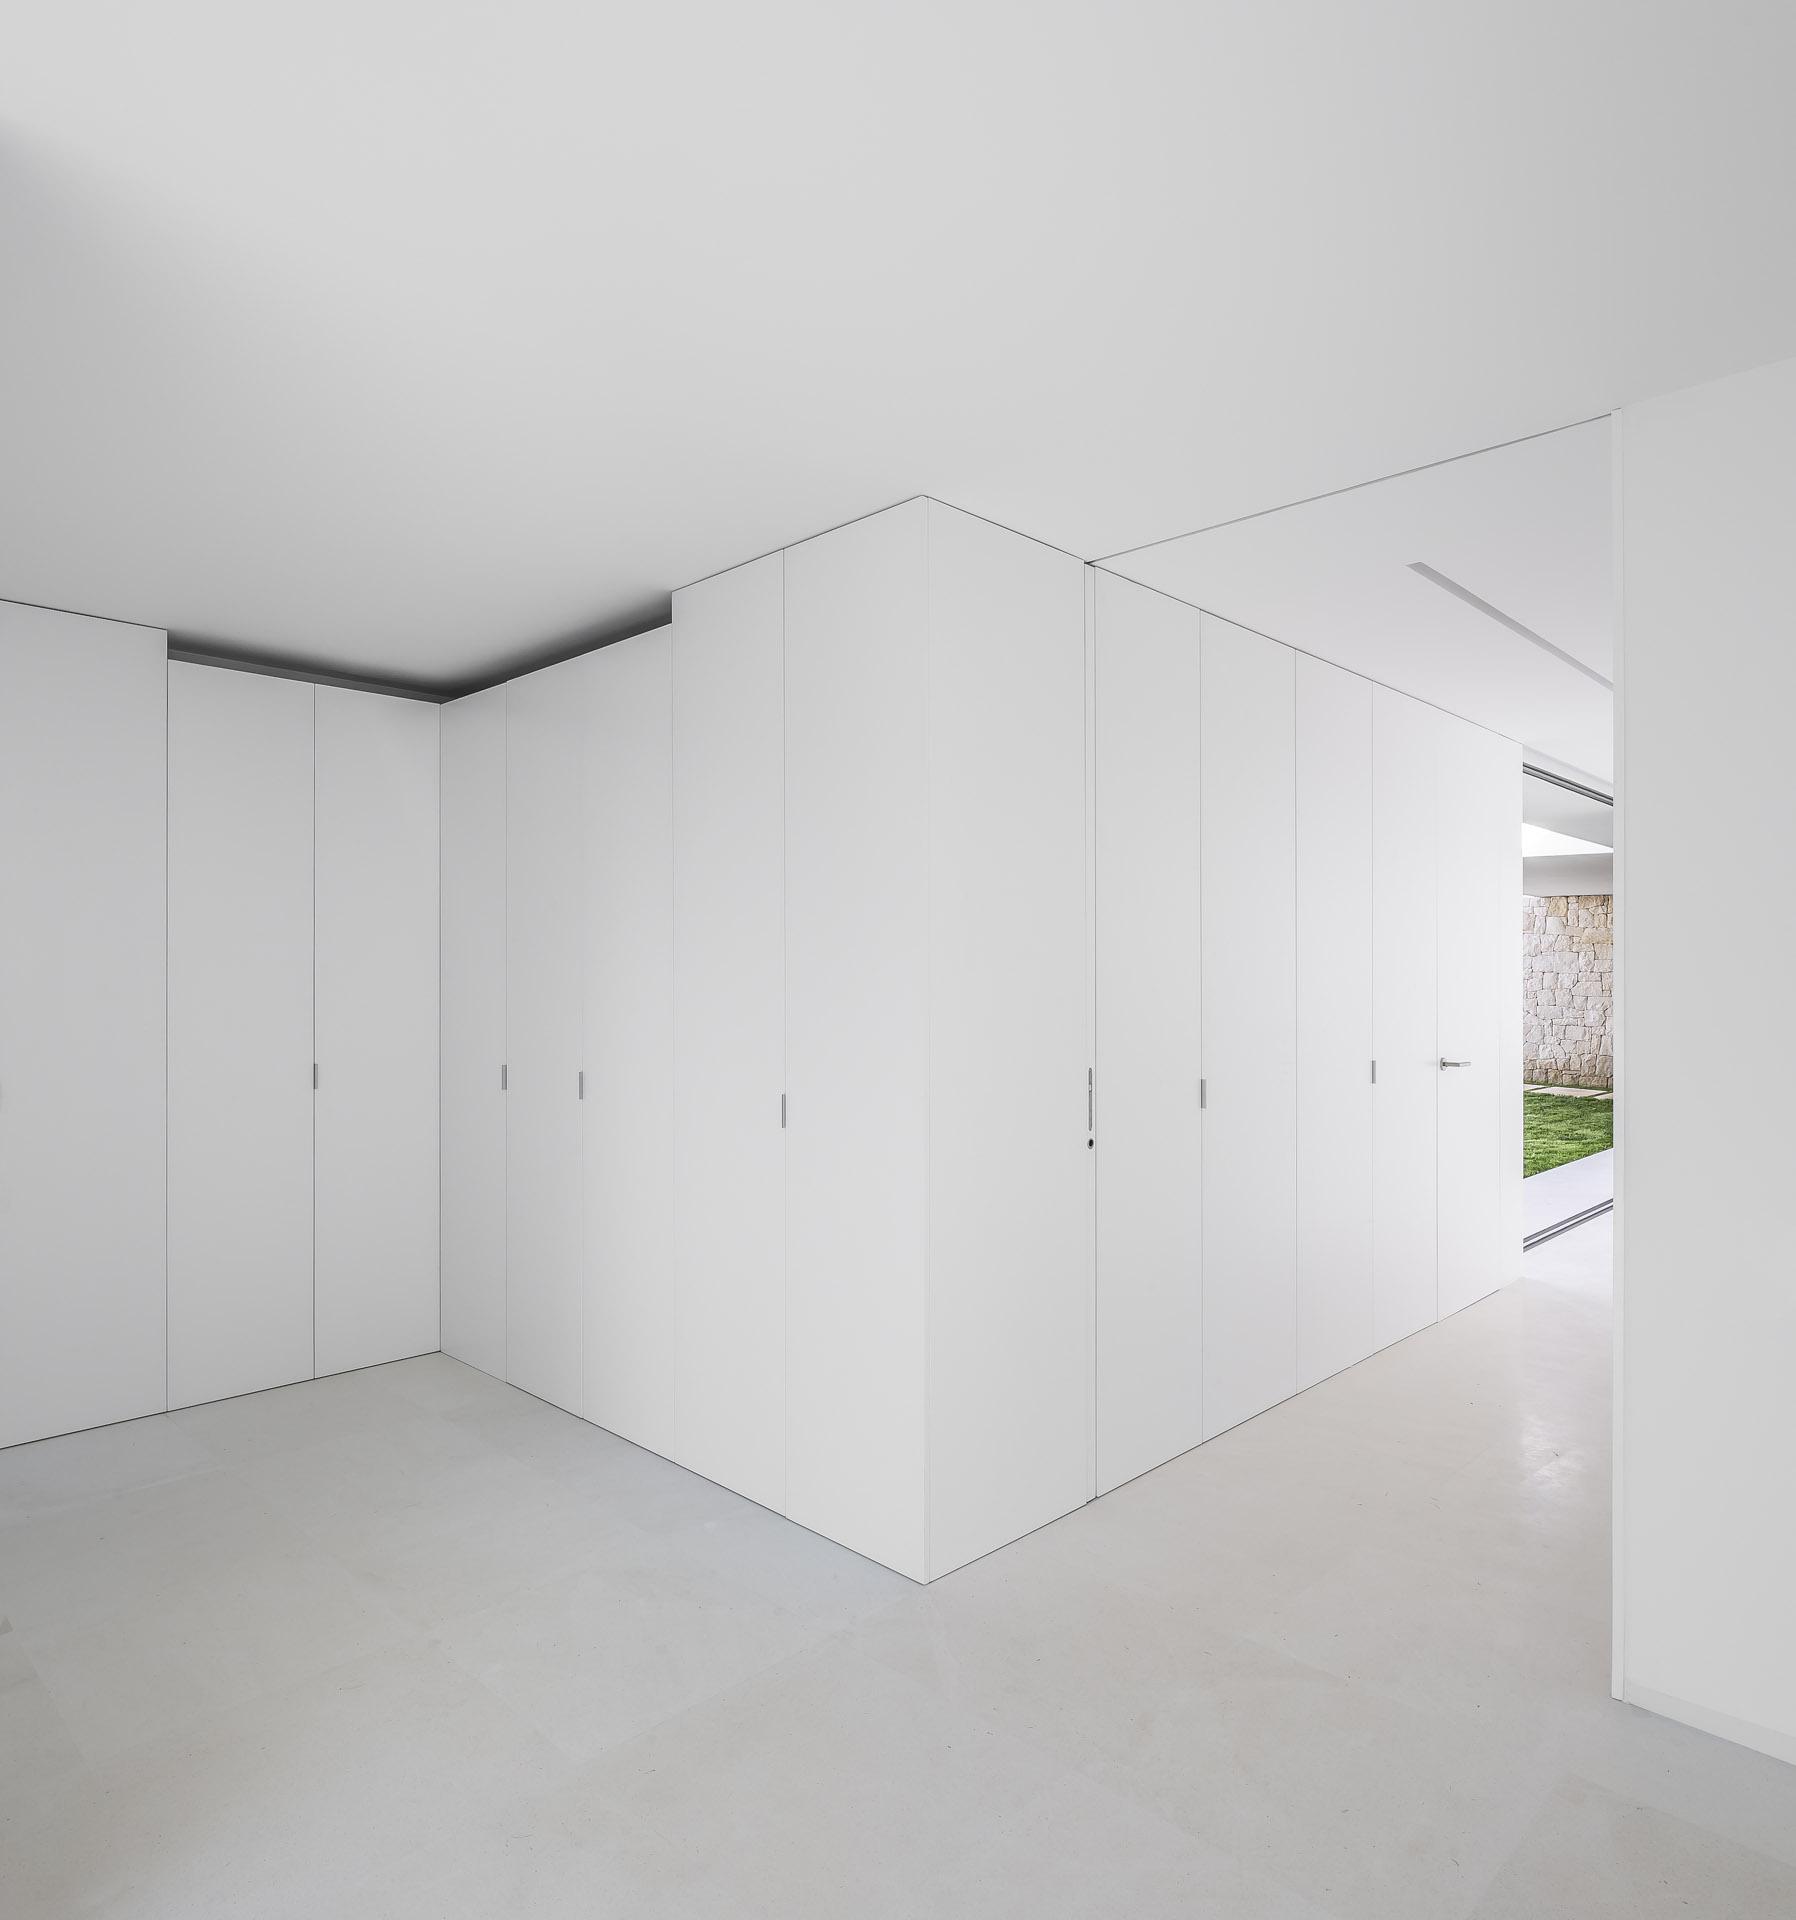 fotografia-arquitectura-valencia-german-cabo-gallardo-llopis-villamarchante-vivienda-25